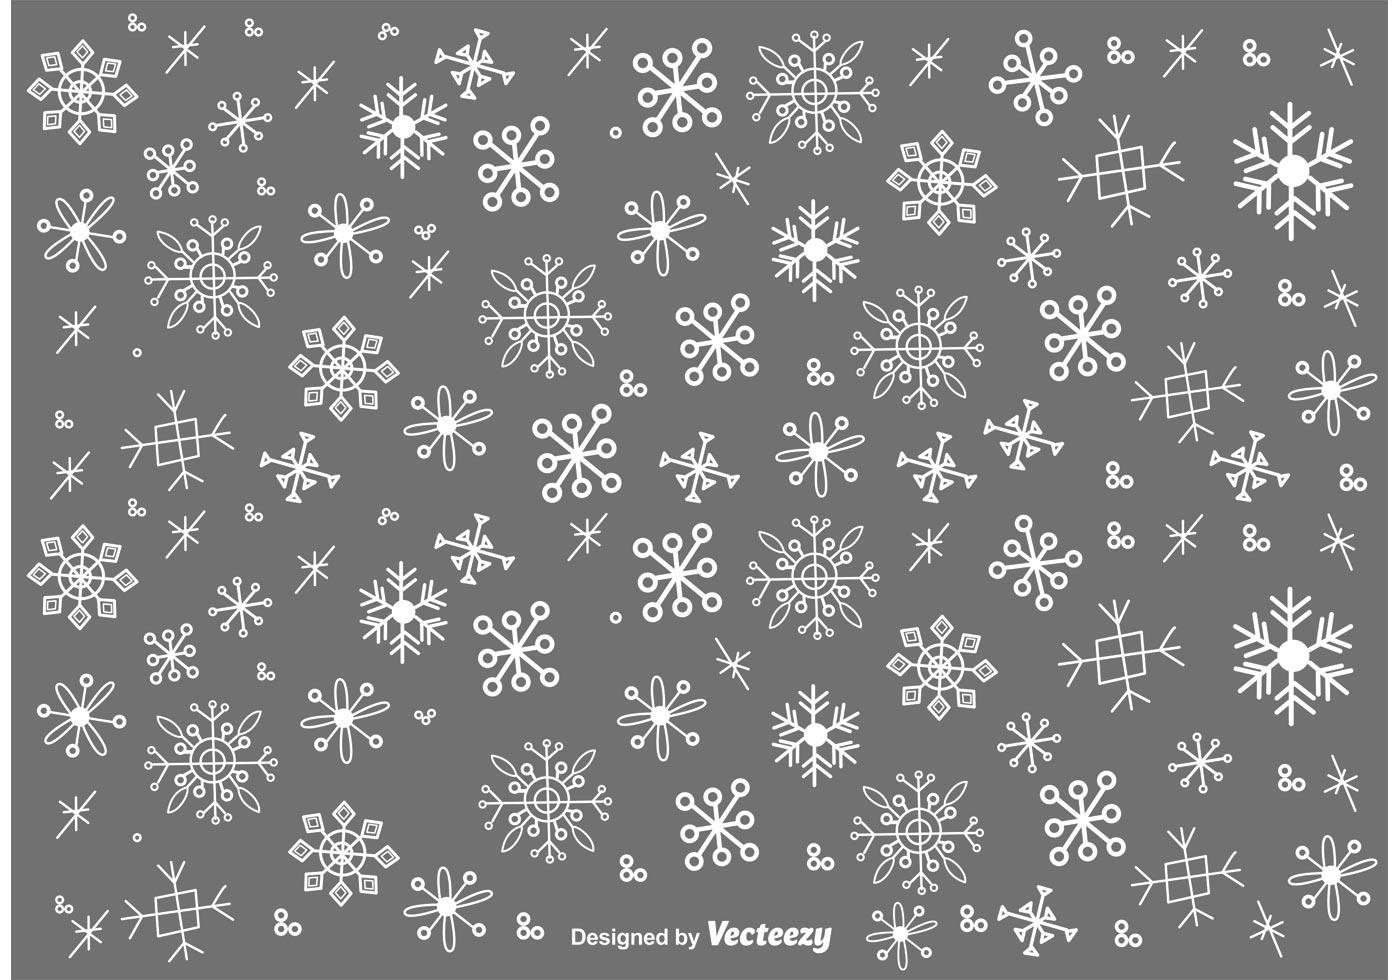 snow flakes doodles vector set